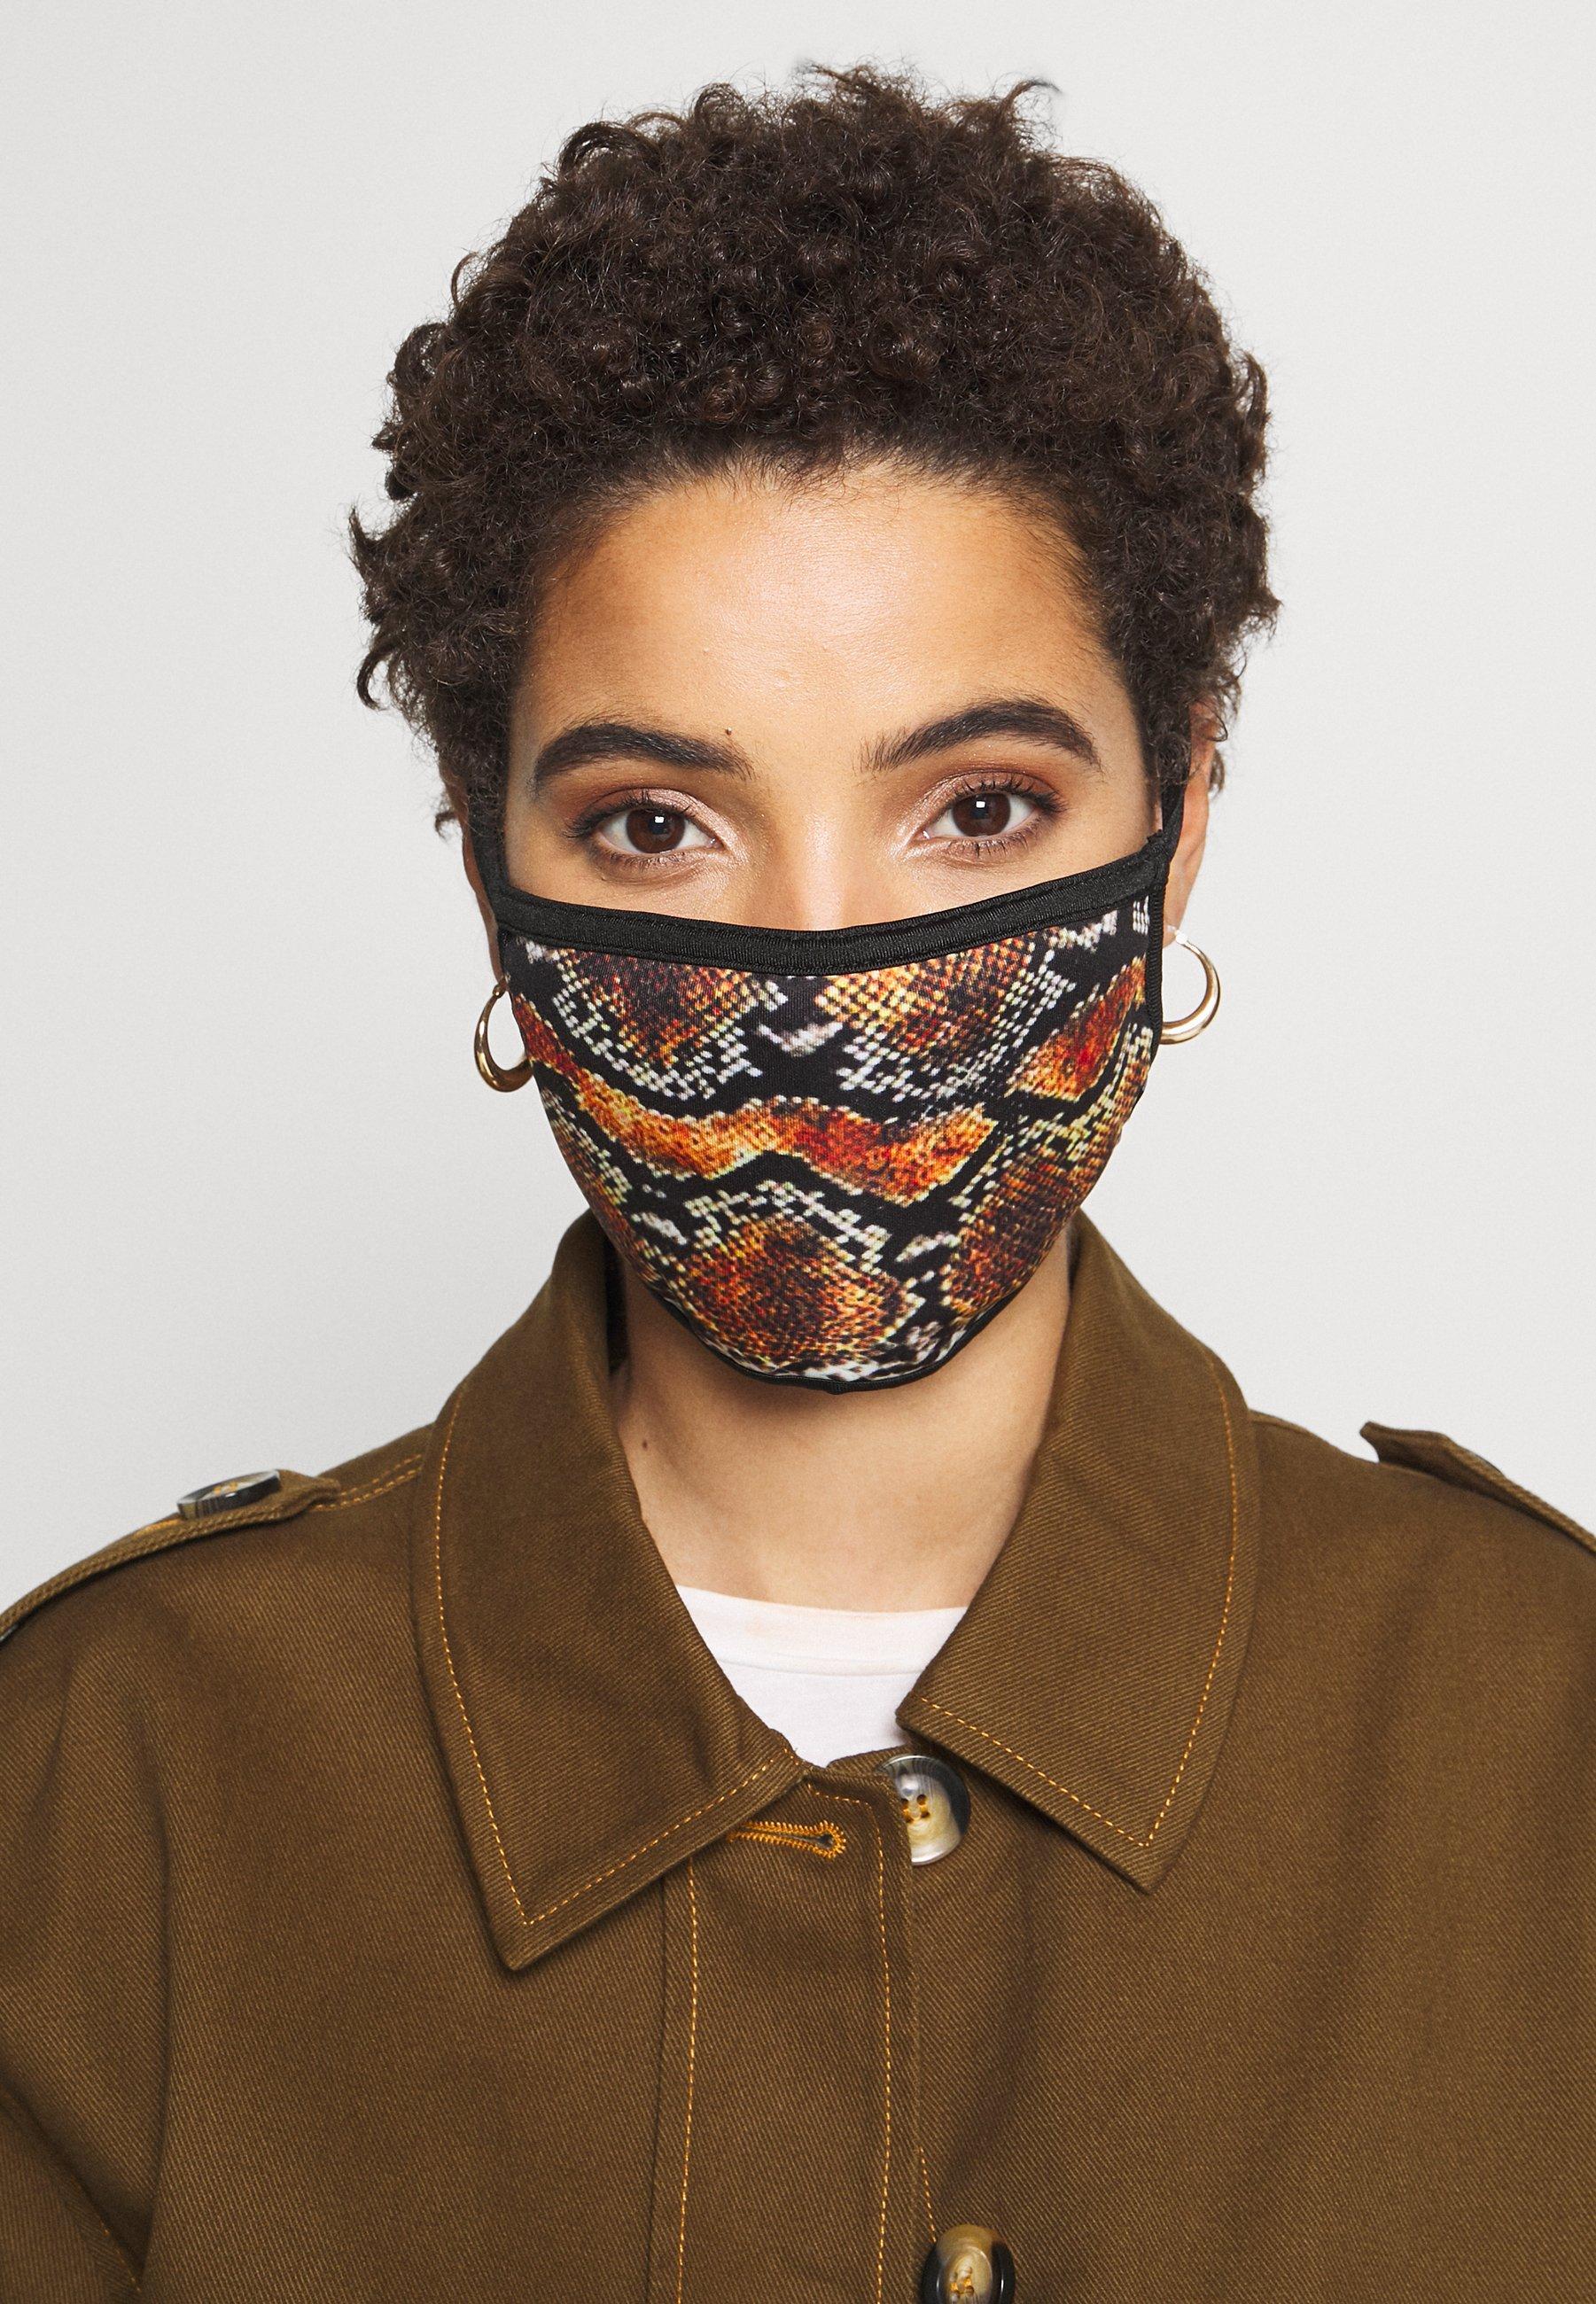 Women COMMUNITY MASK 3 PACK - Community mask